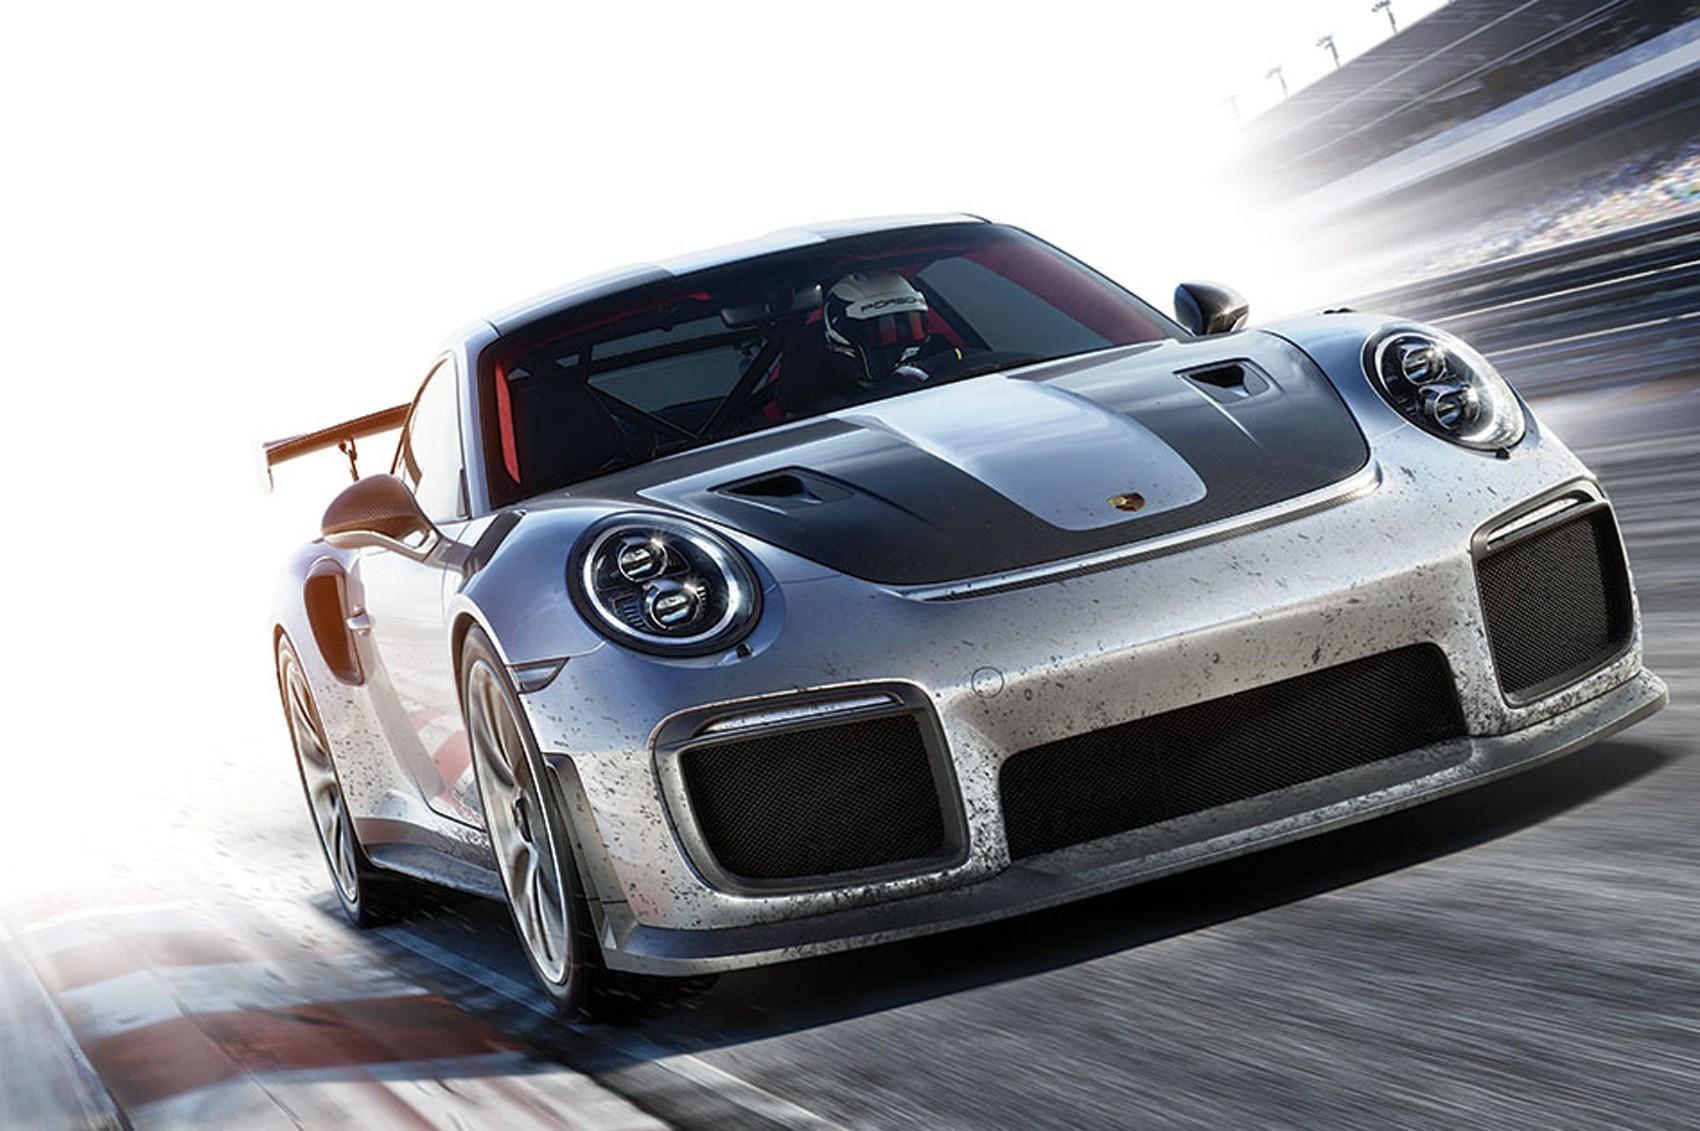 porsche_911_gt2rs_93 Gorgeous Porsche 911 Gt2 Rs Essai Cars Trend